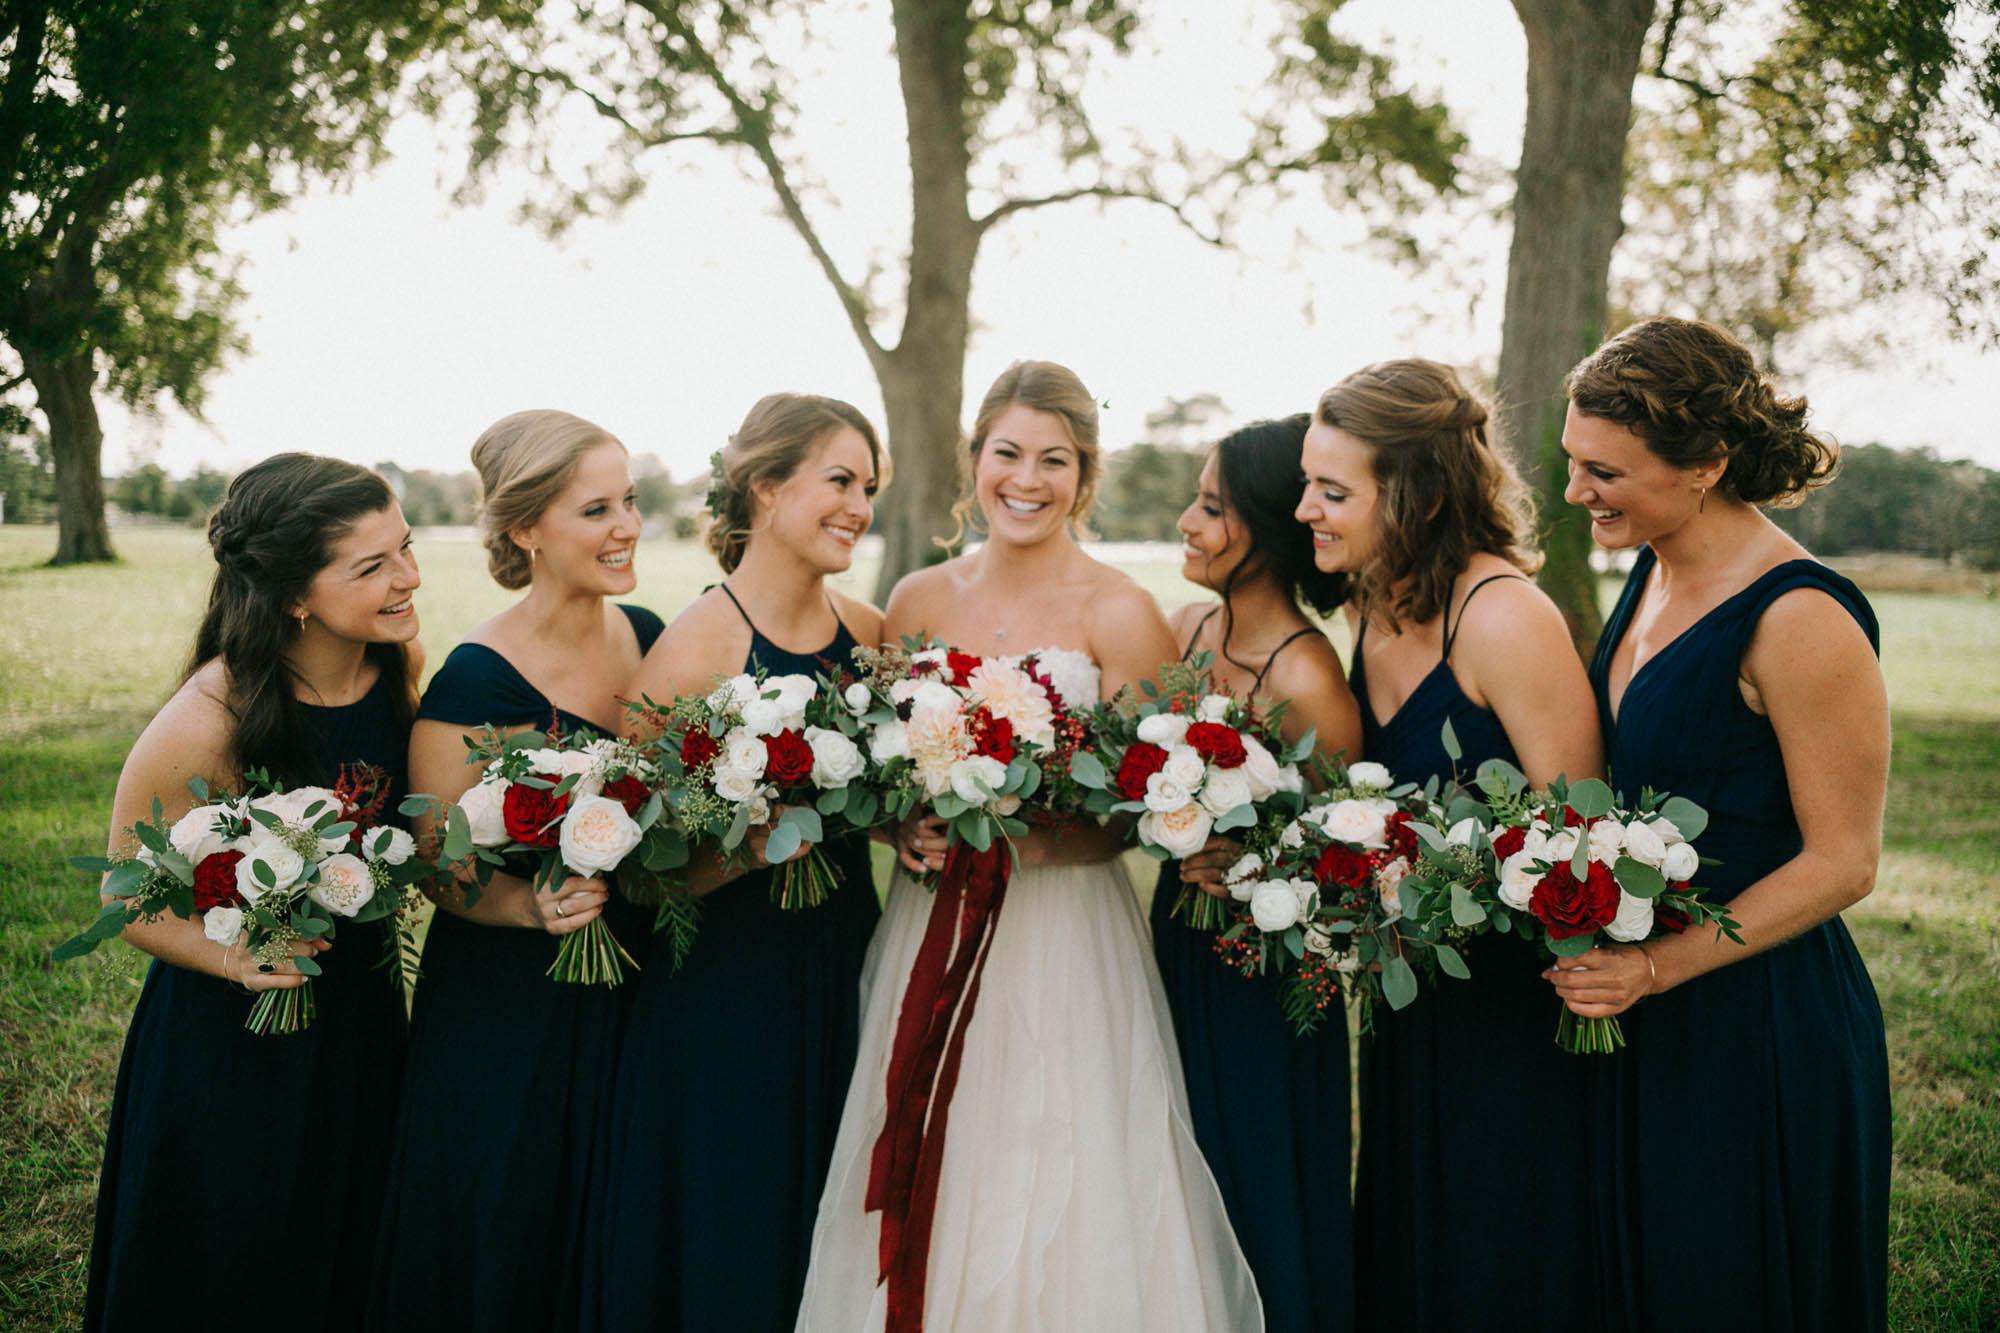 Hissey_WeddingParty_PMERE2017-6.jpg